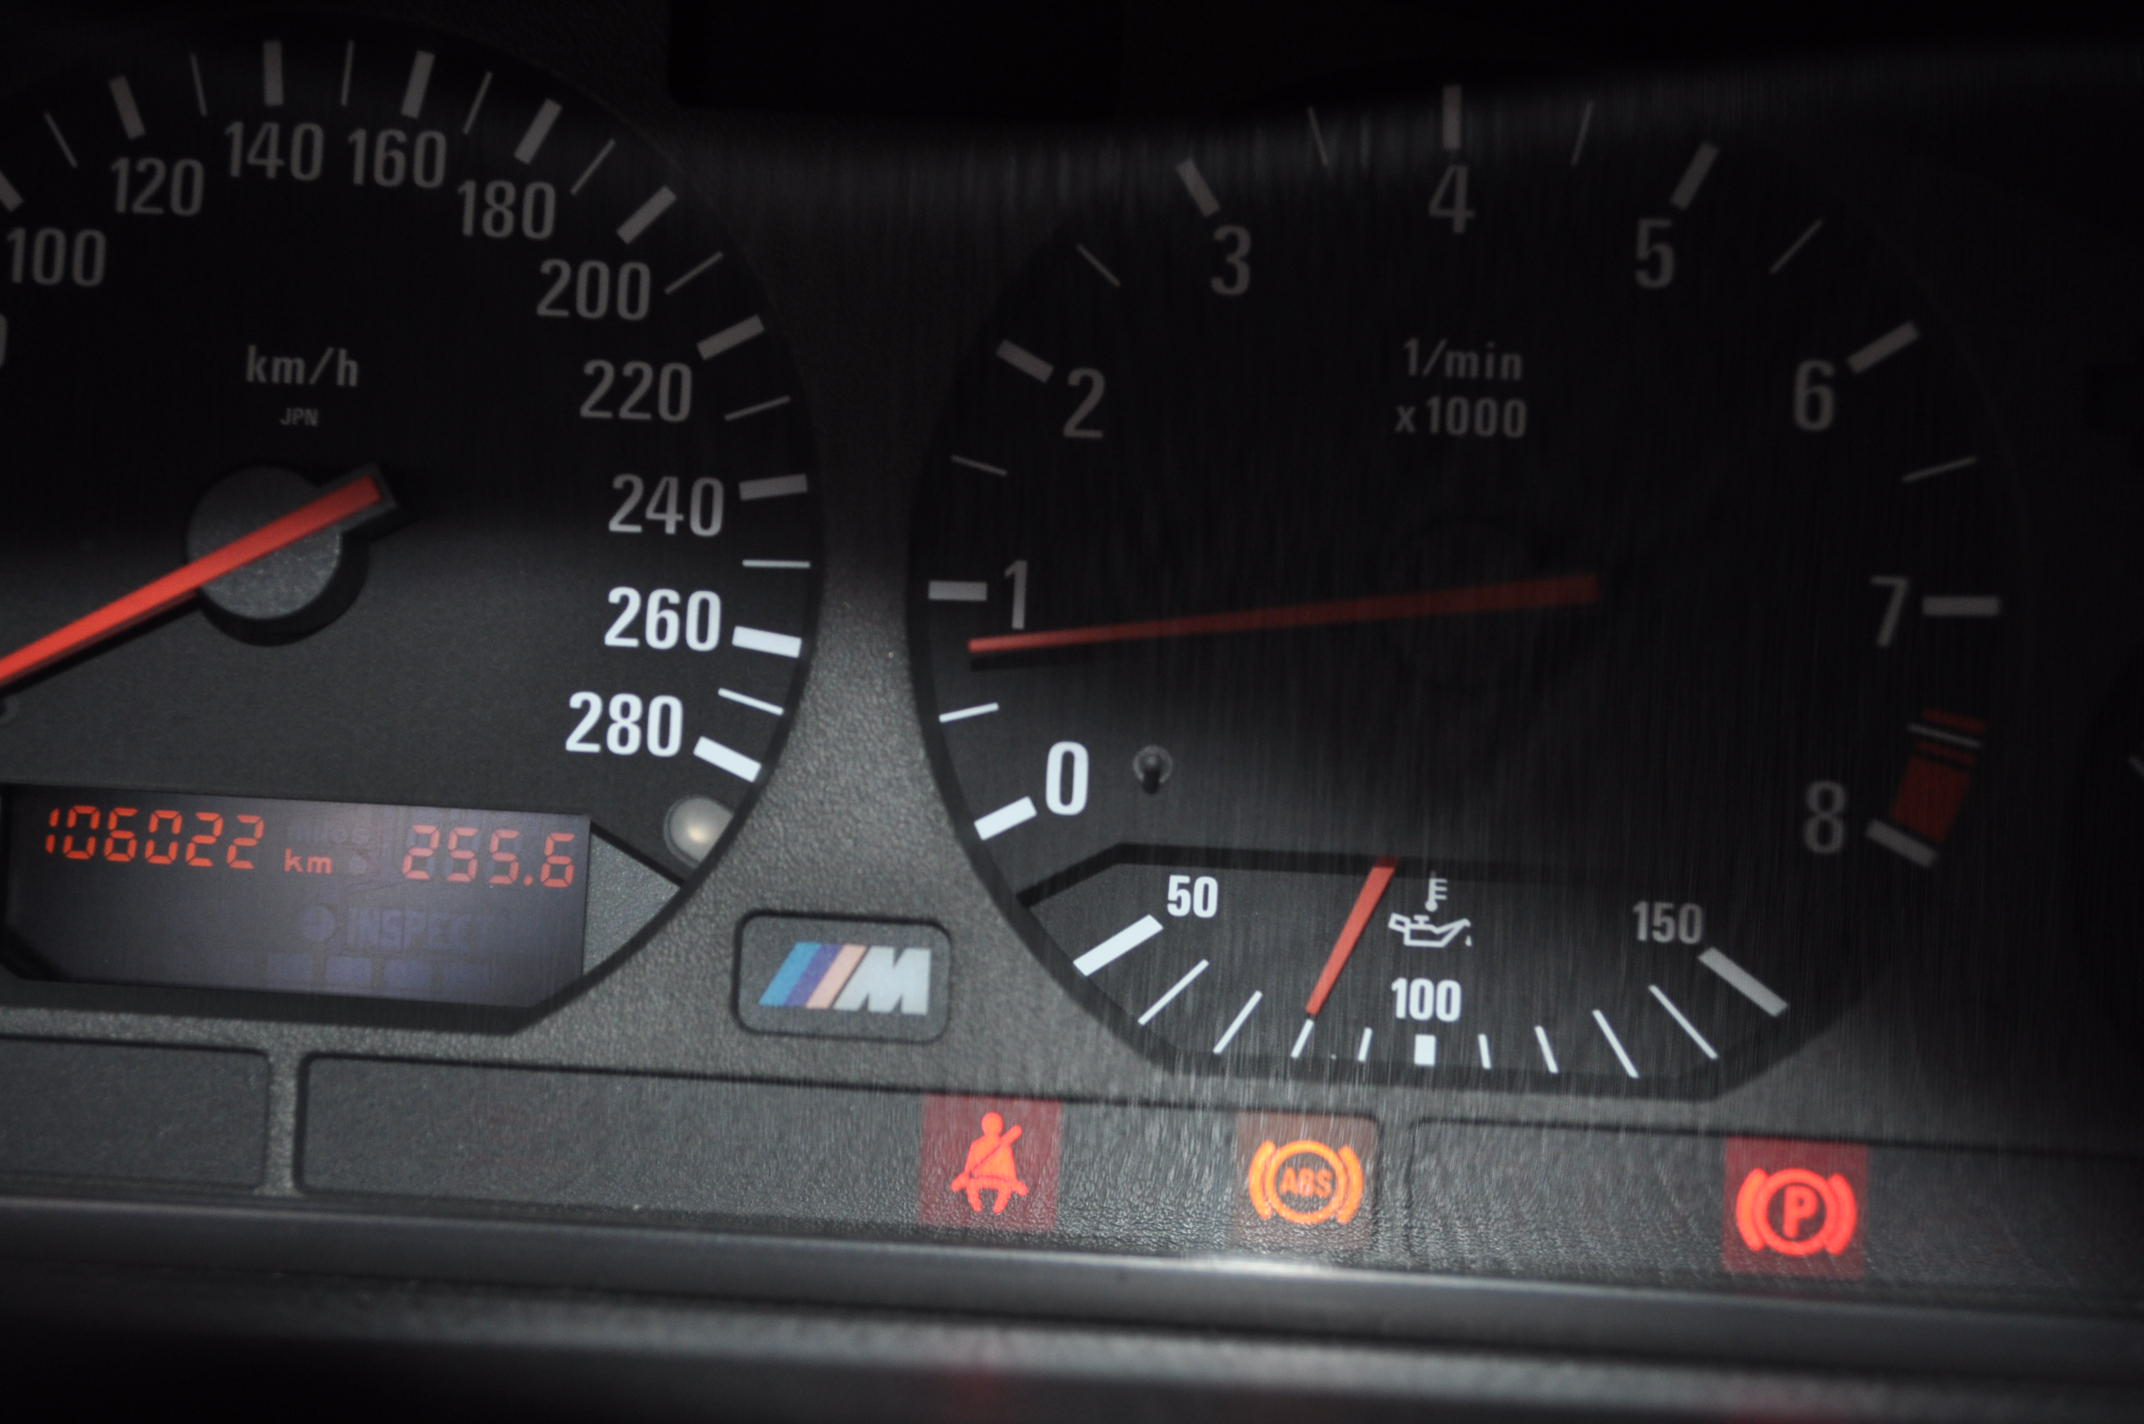 BMW E36 ABSユニット故障時のランプ点灯の様子